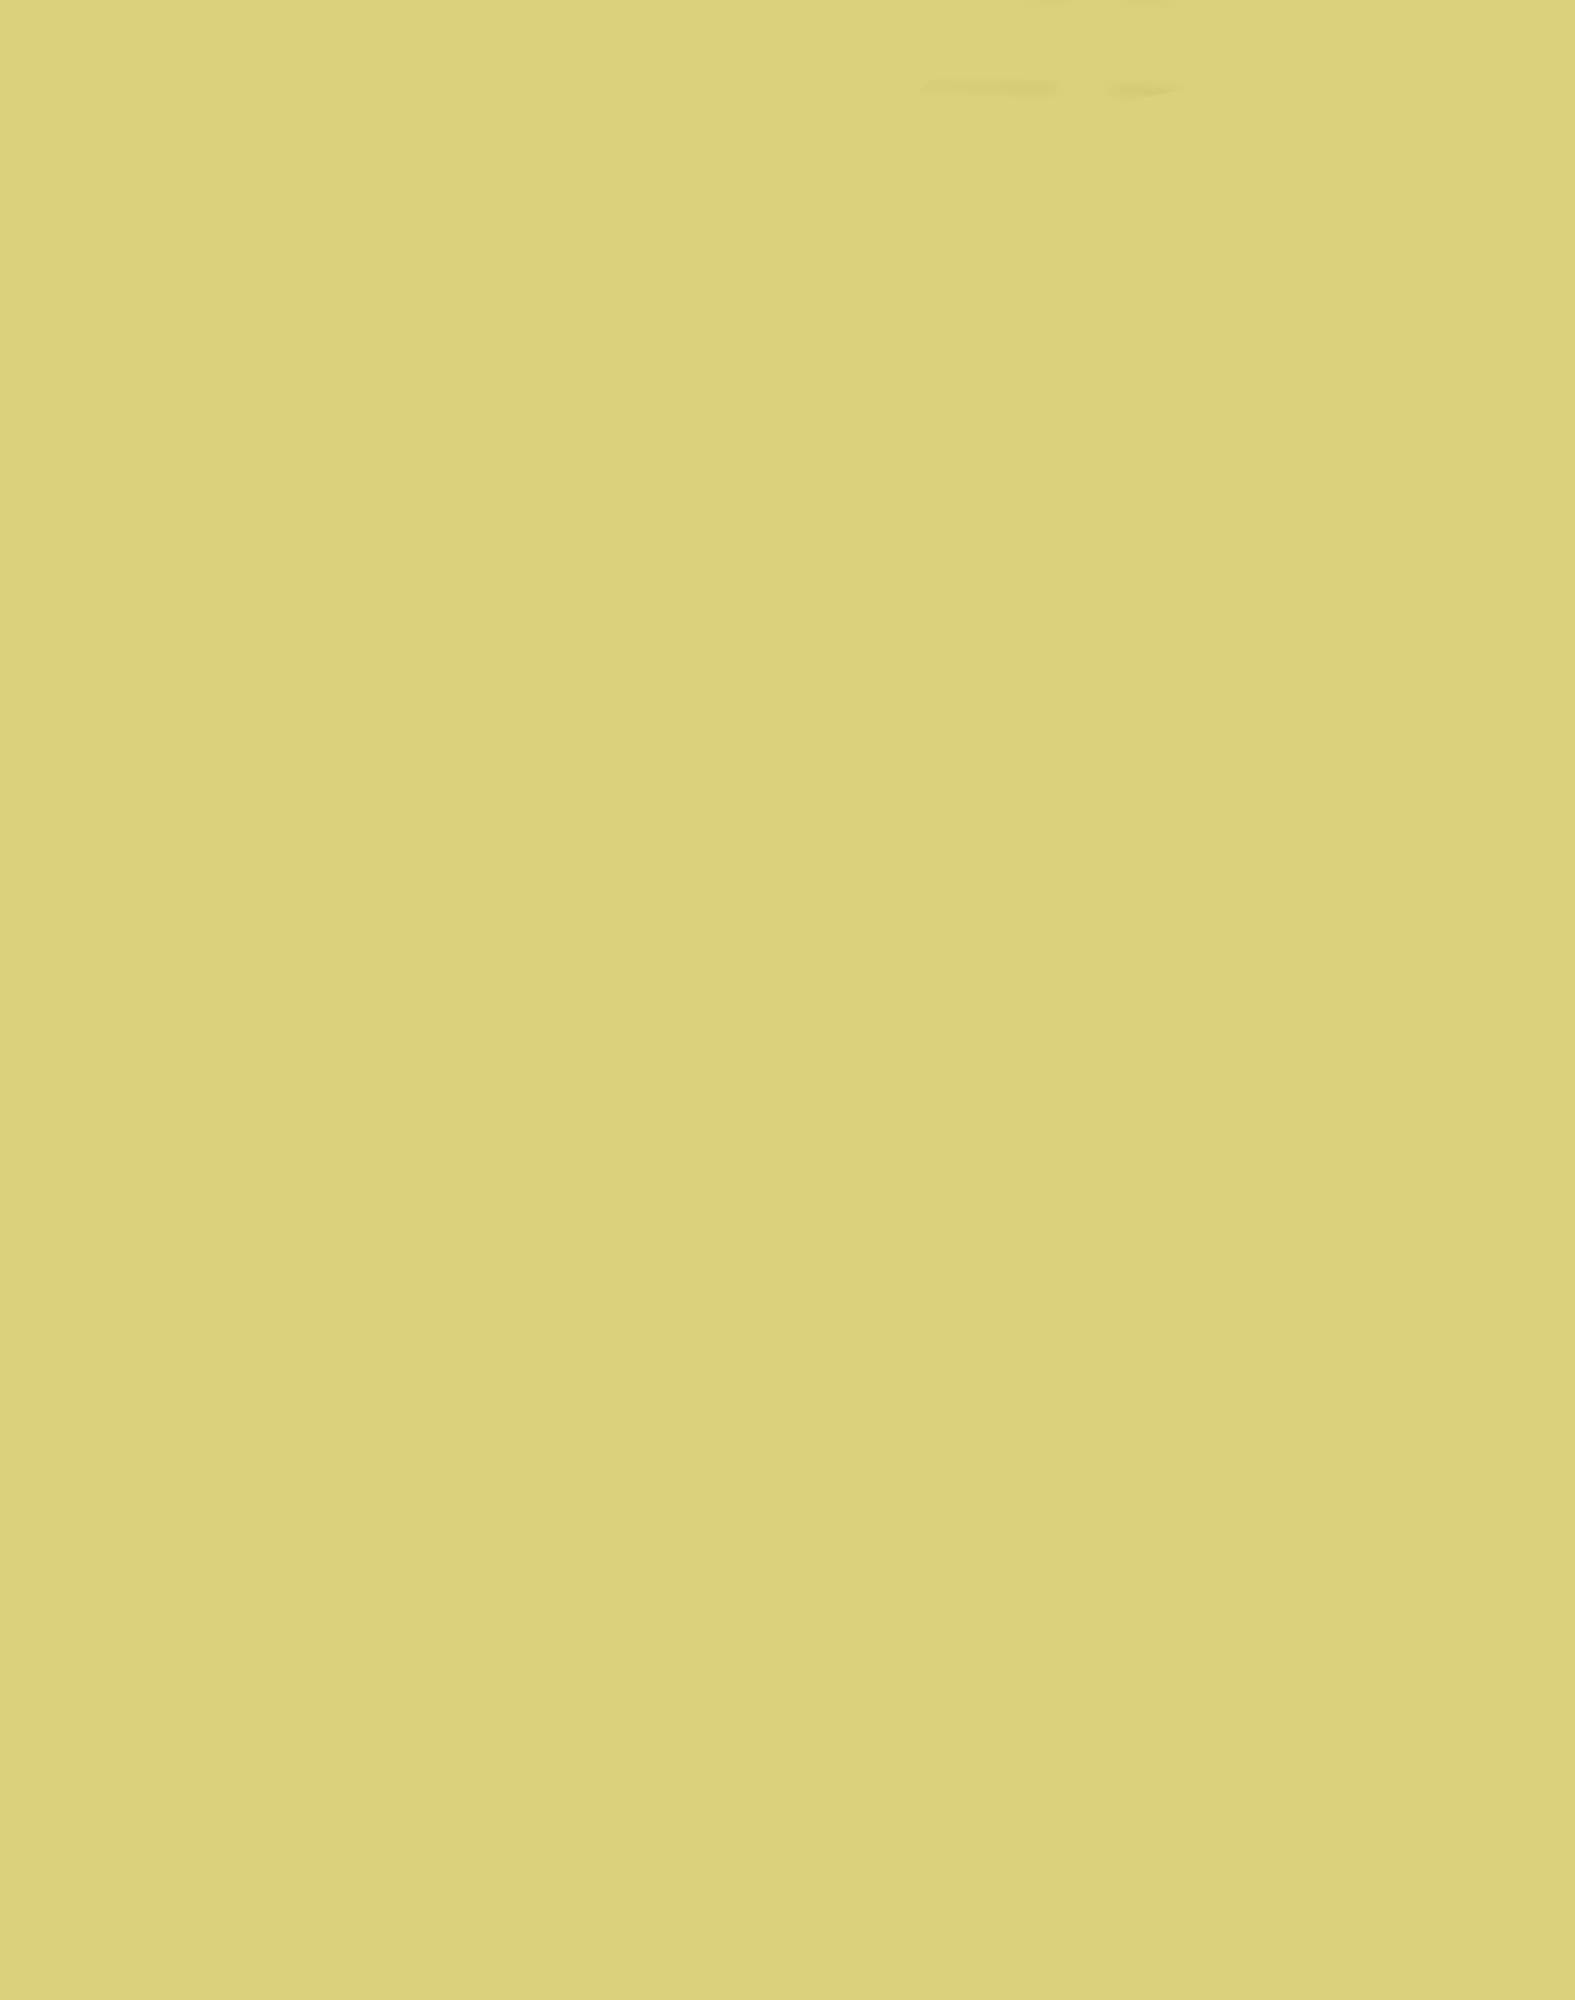 Apple Spritz 219,208,123